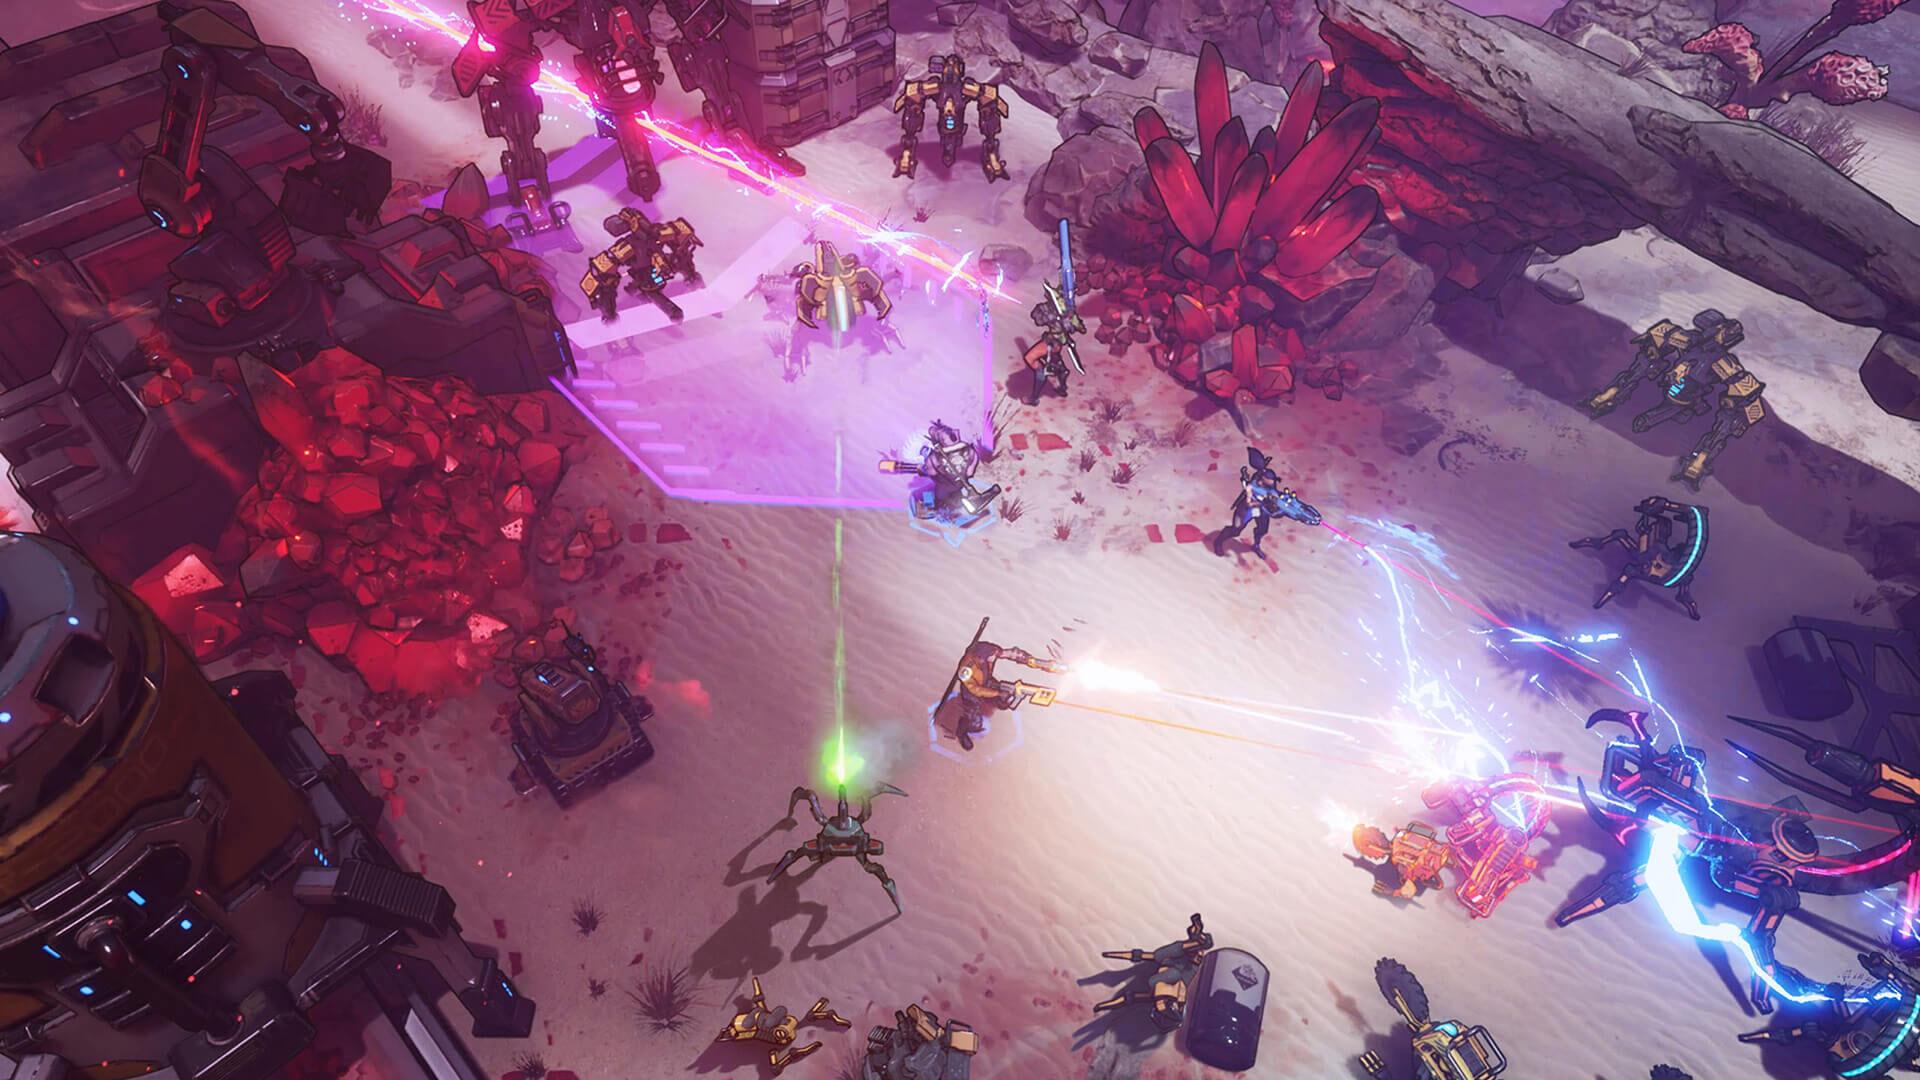 Space Punks Screenshot multiplayer